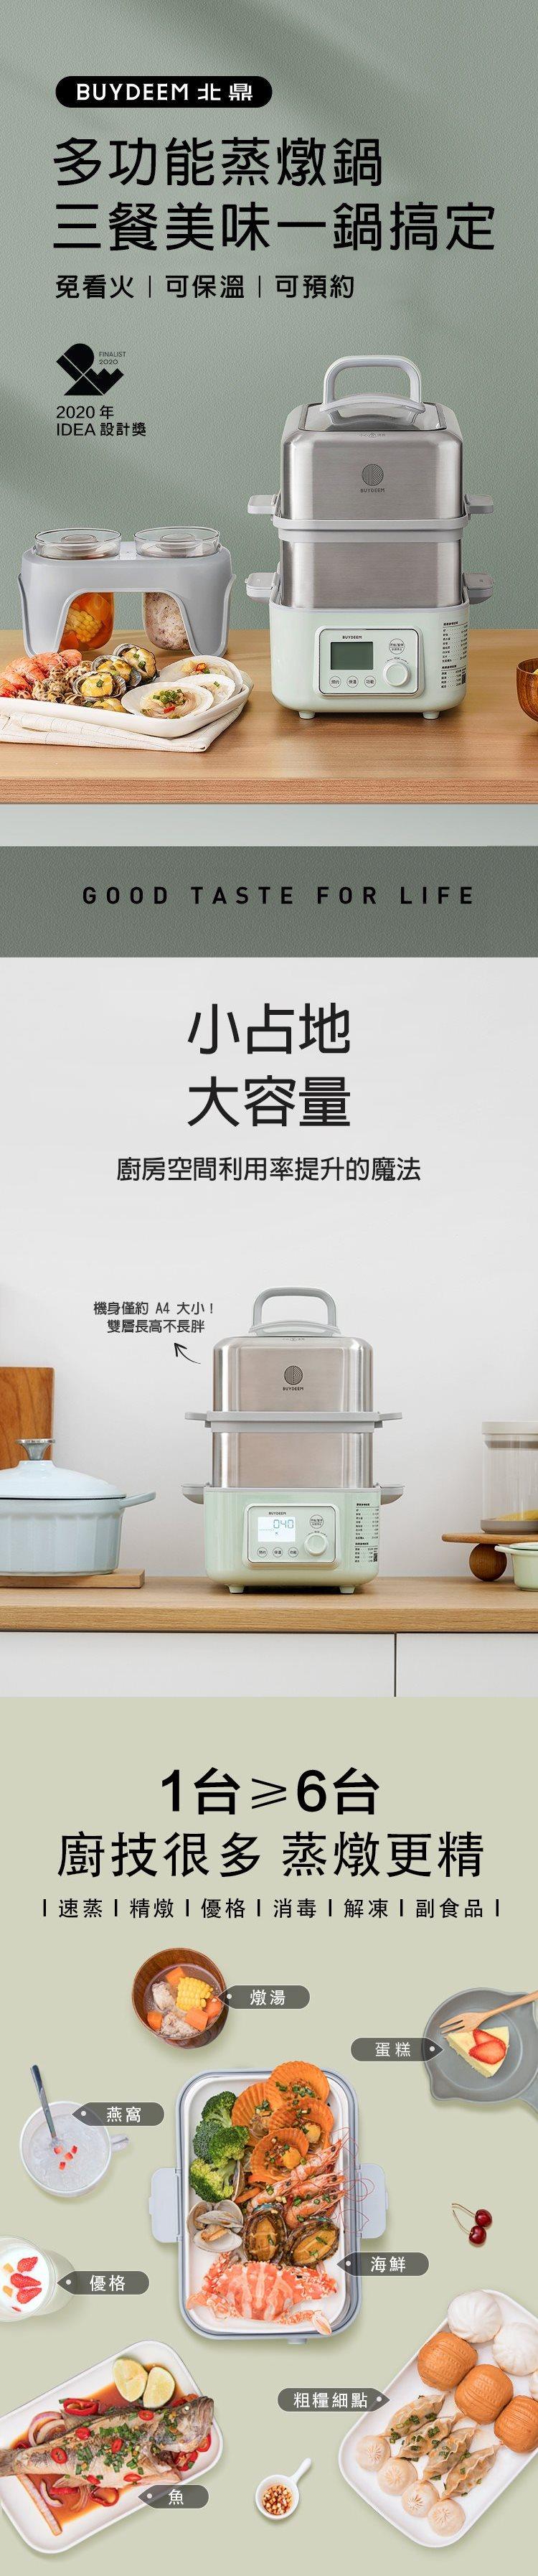 BUYDEEM北鼎多功能蒸燉鍋-00-產品特色